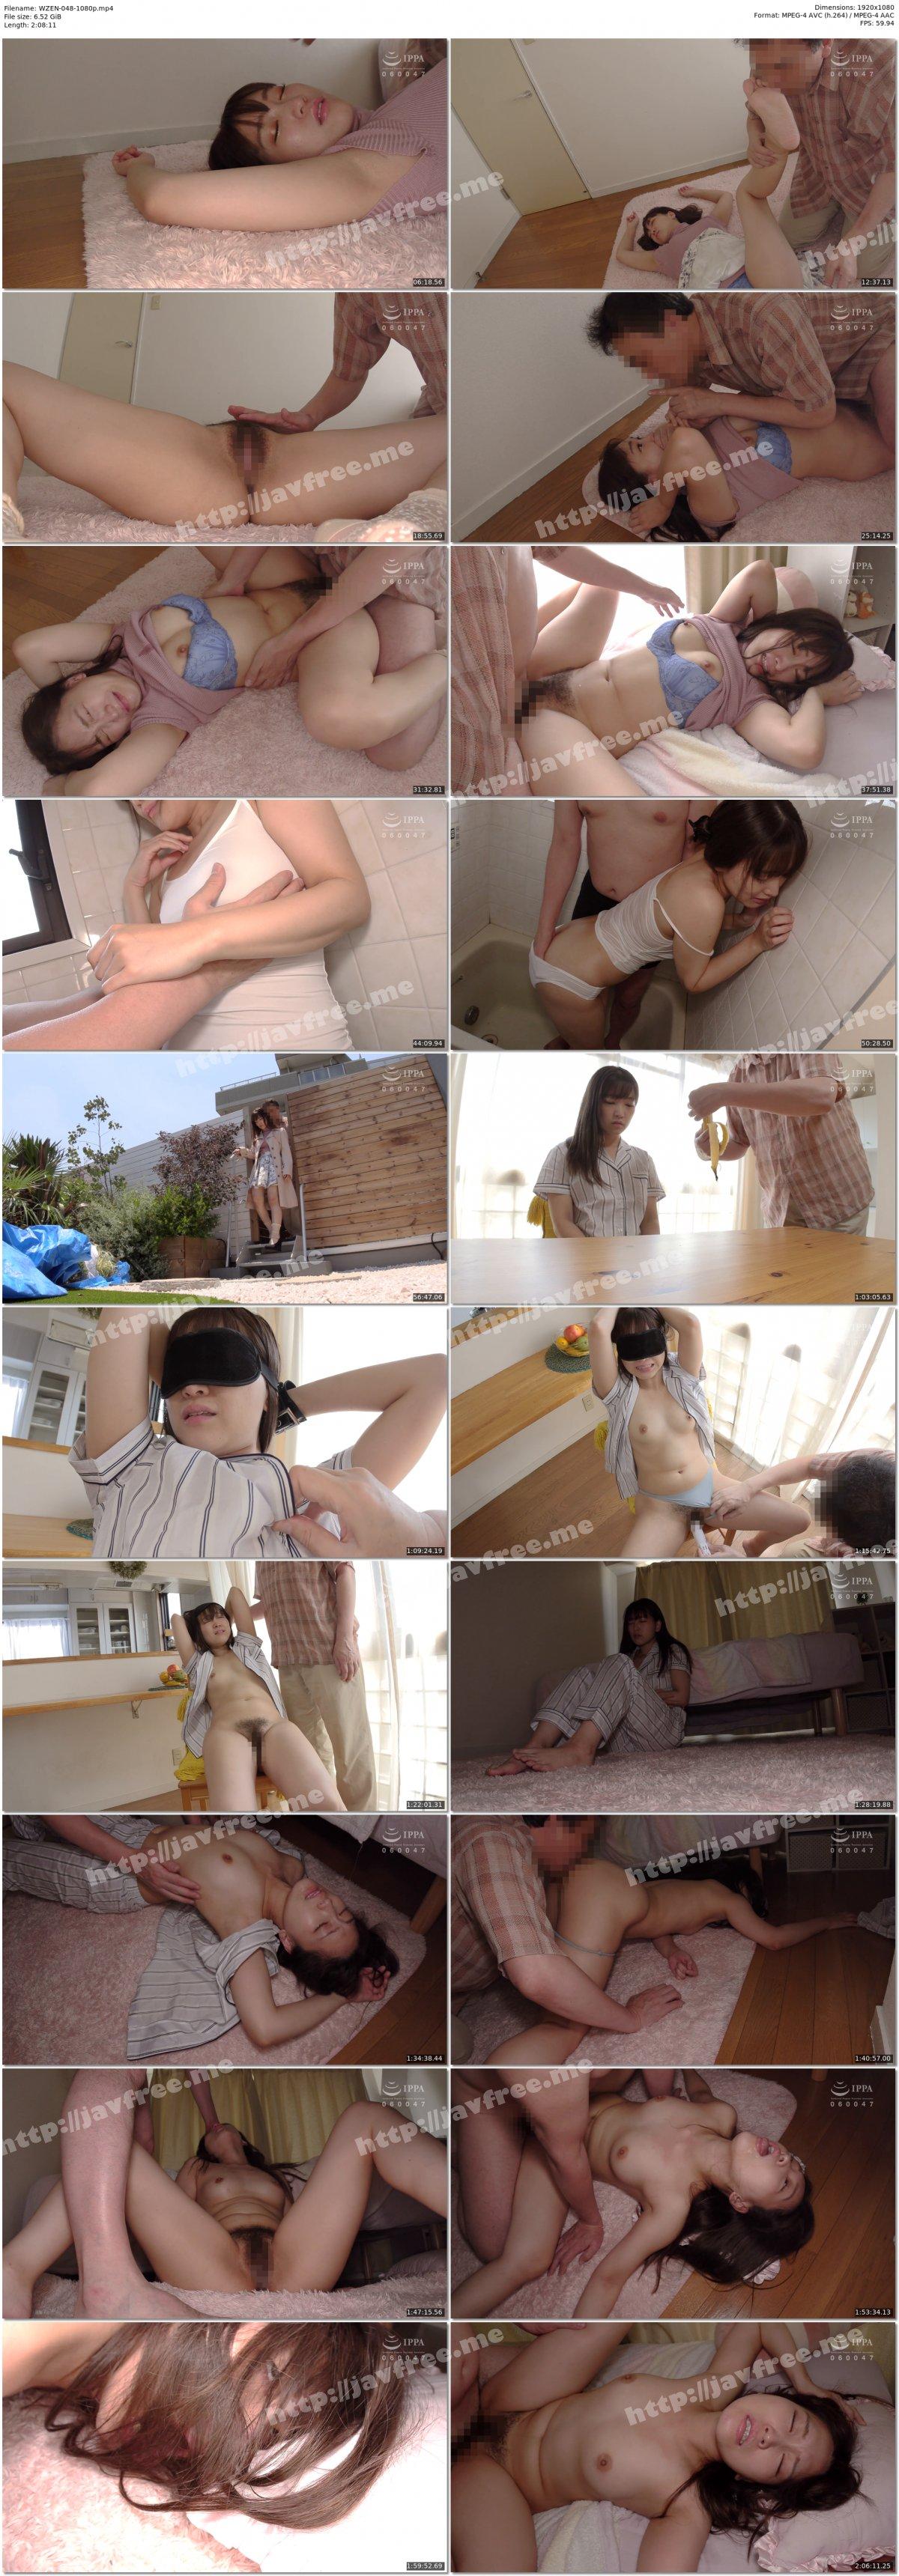 [HD][WZEN-048] 発禁 01 製薬会社OL 美佳(27) - image WZEN-048-1080p on https://javfree.me